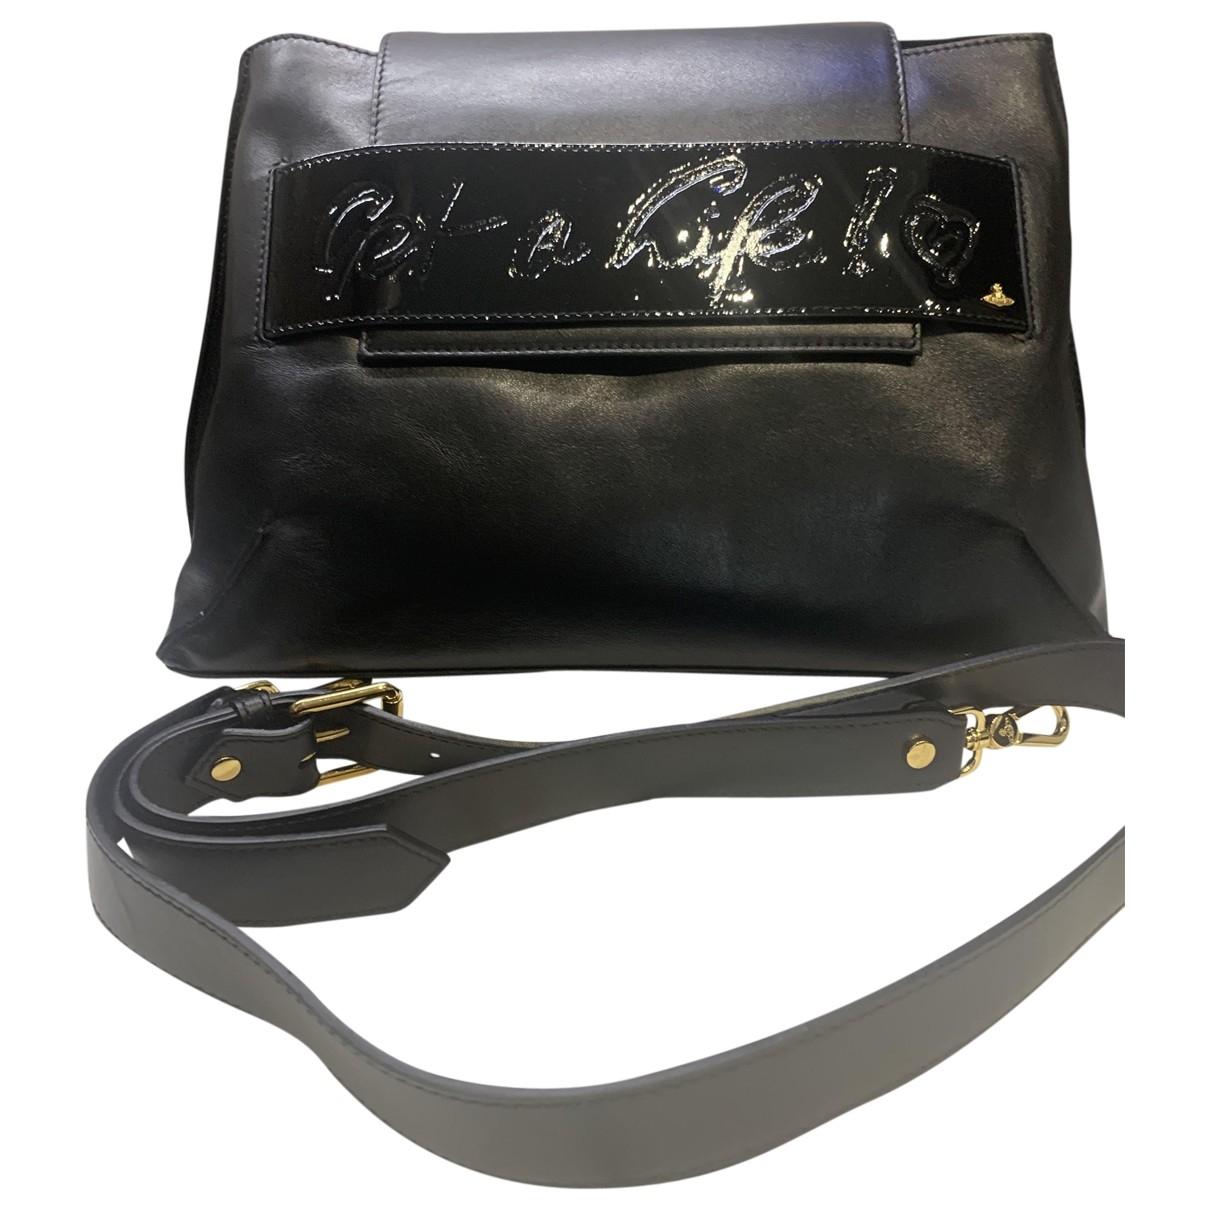 Vivienne Westwood \N Handtasche in  Schwarz Kalbsleder in Pony-Optik